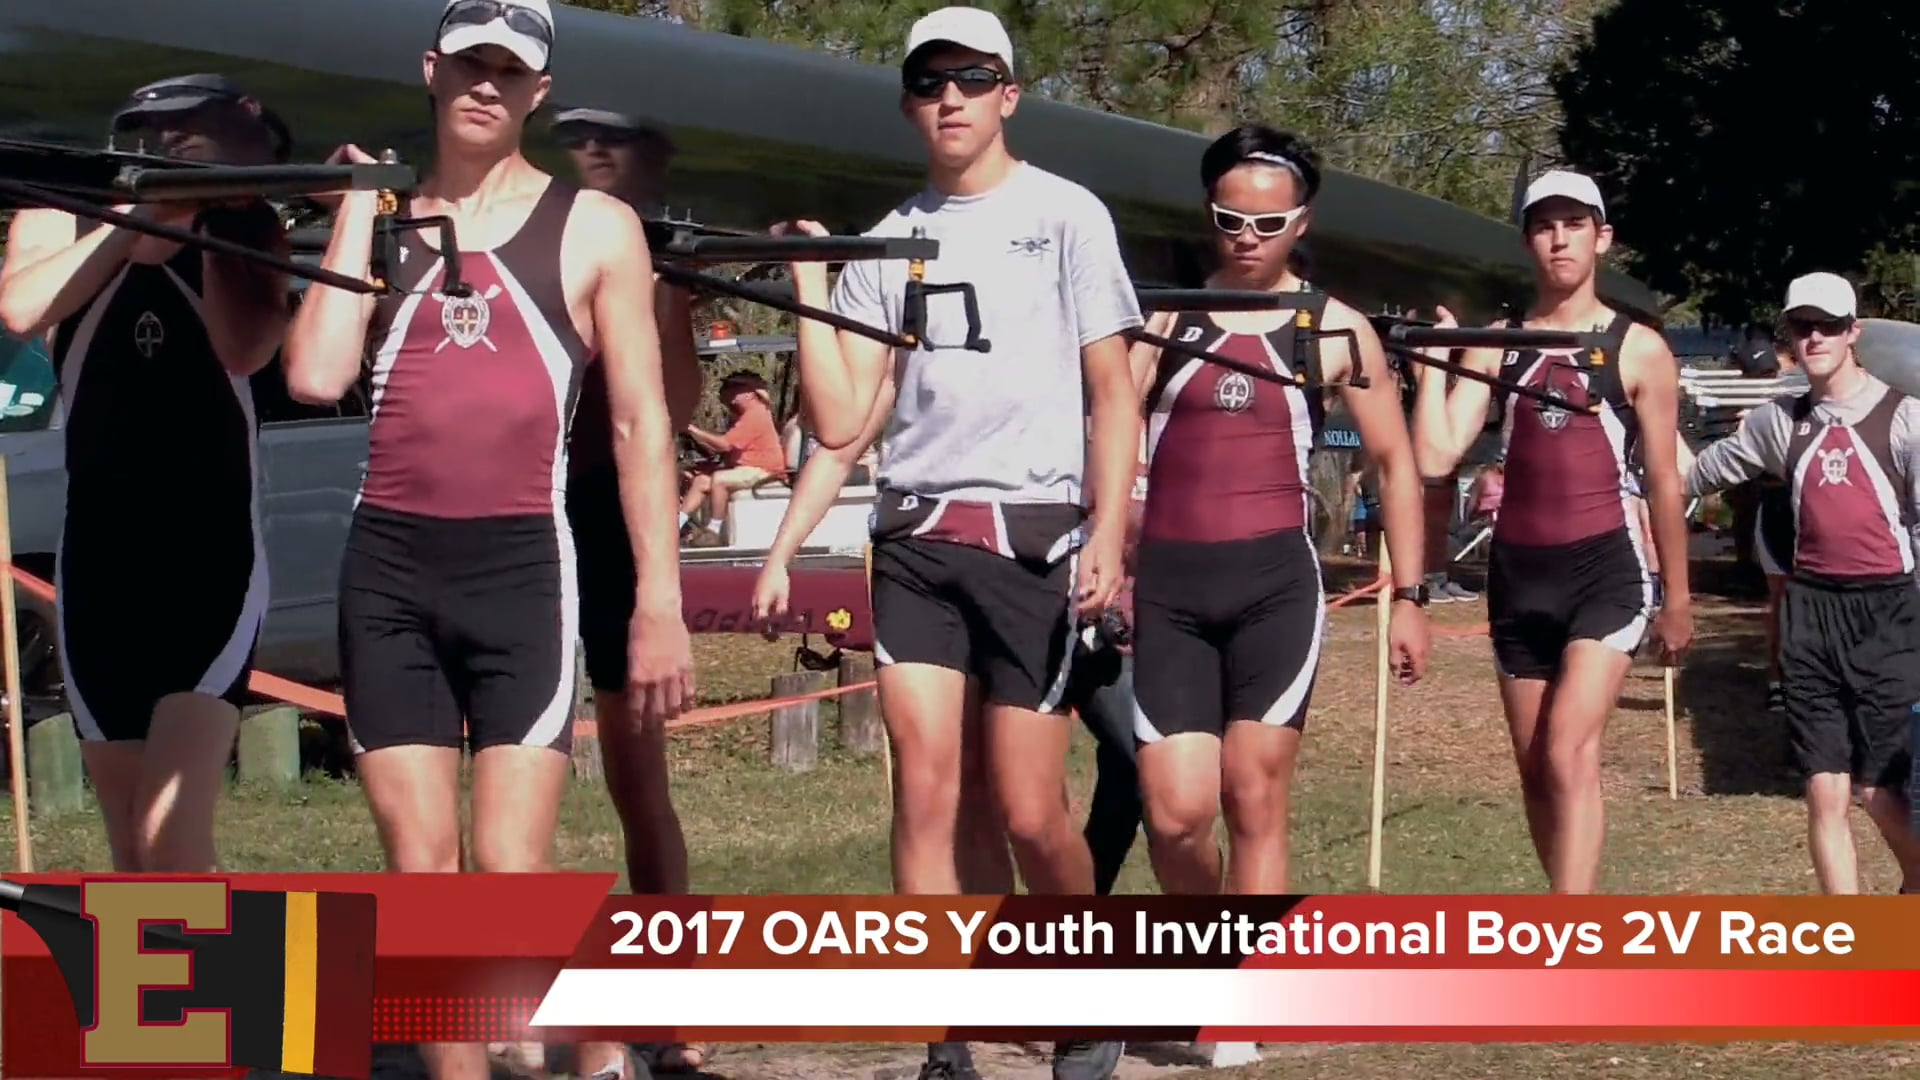 Boys 2V8+ Race 2017 OARS Youth Invitational